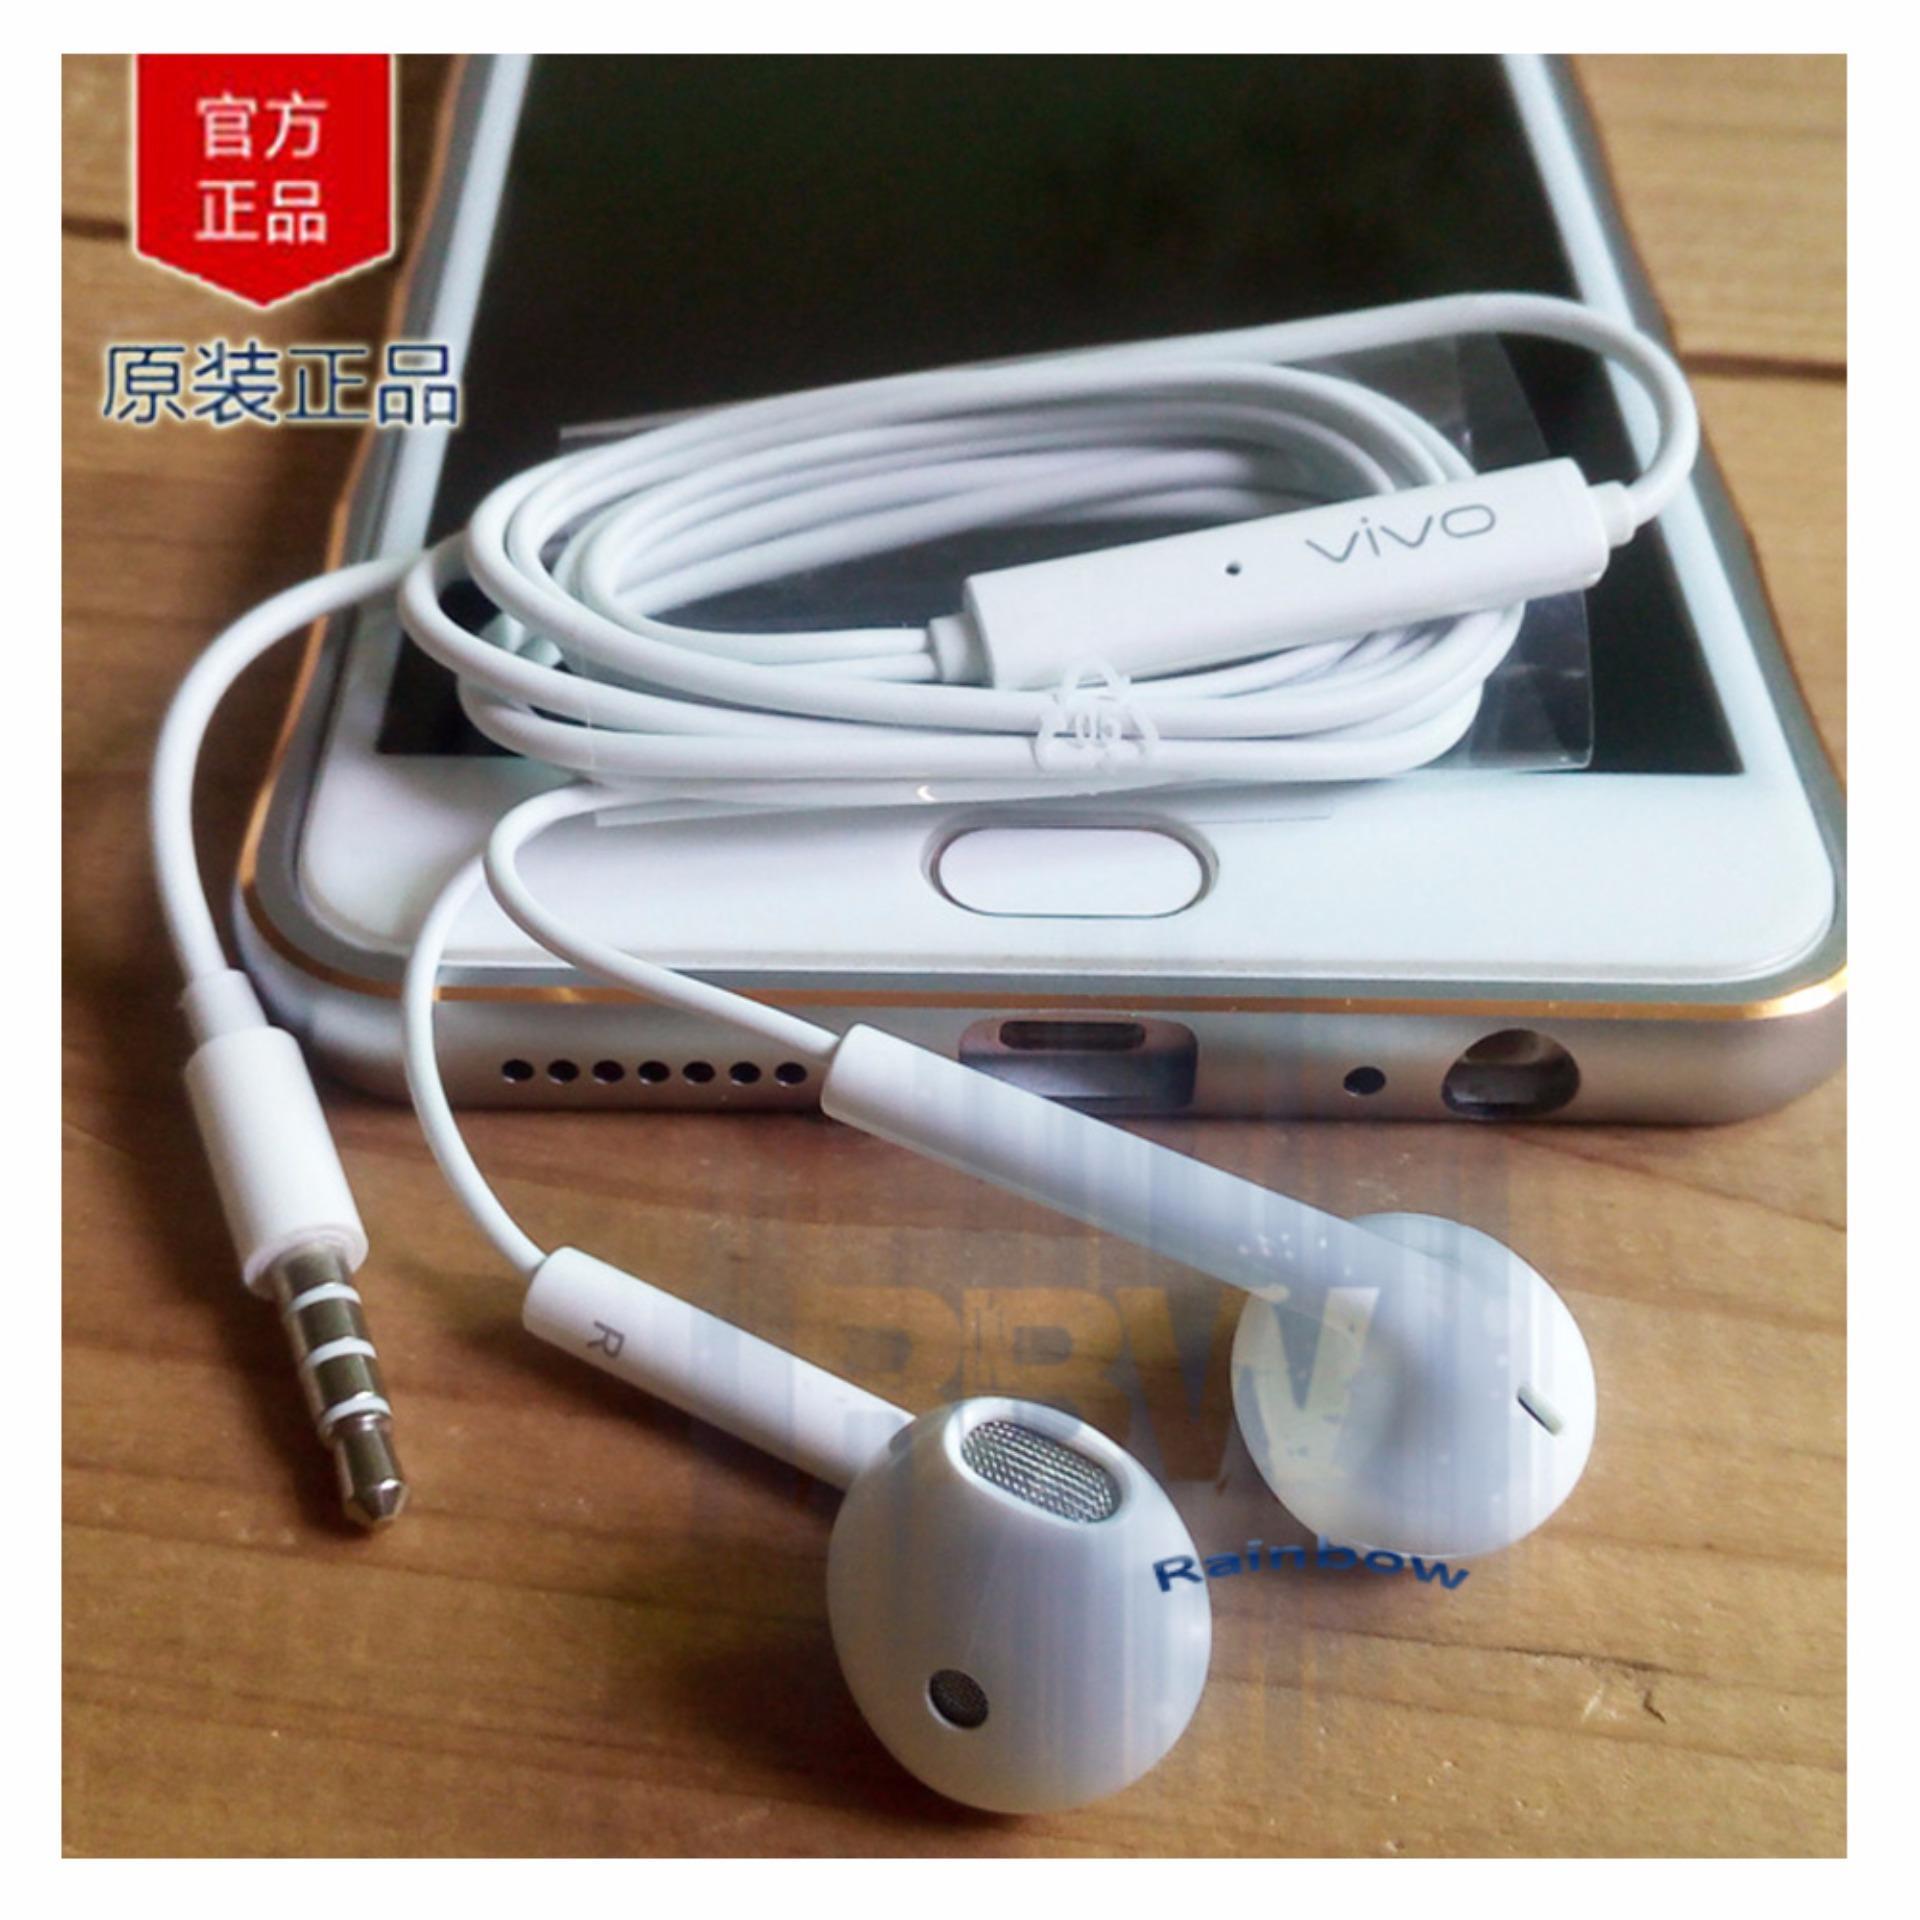 Daftar Harga Vivo Handsfree V5 Xe680 Original Headset All Smartphone Portjack 35mm Earphone